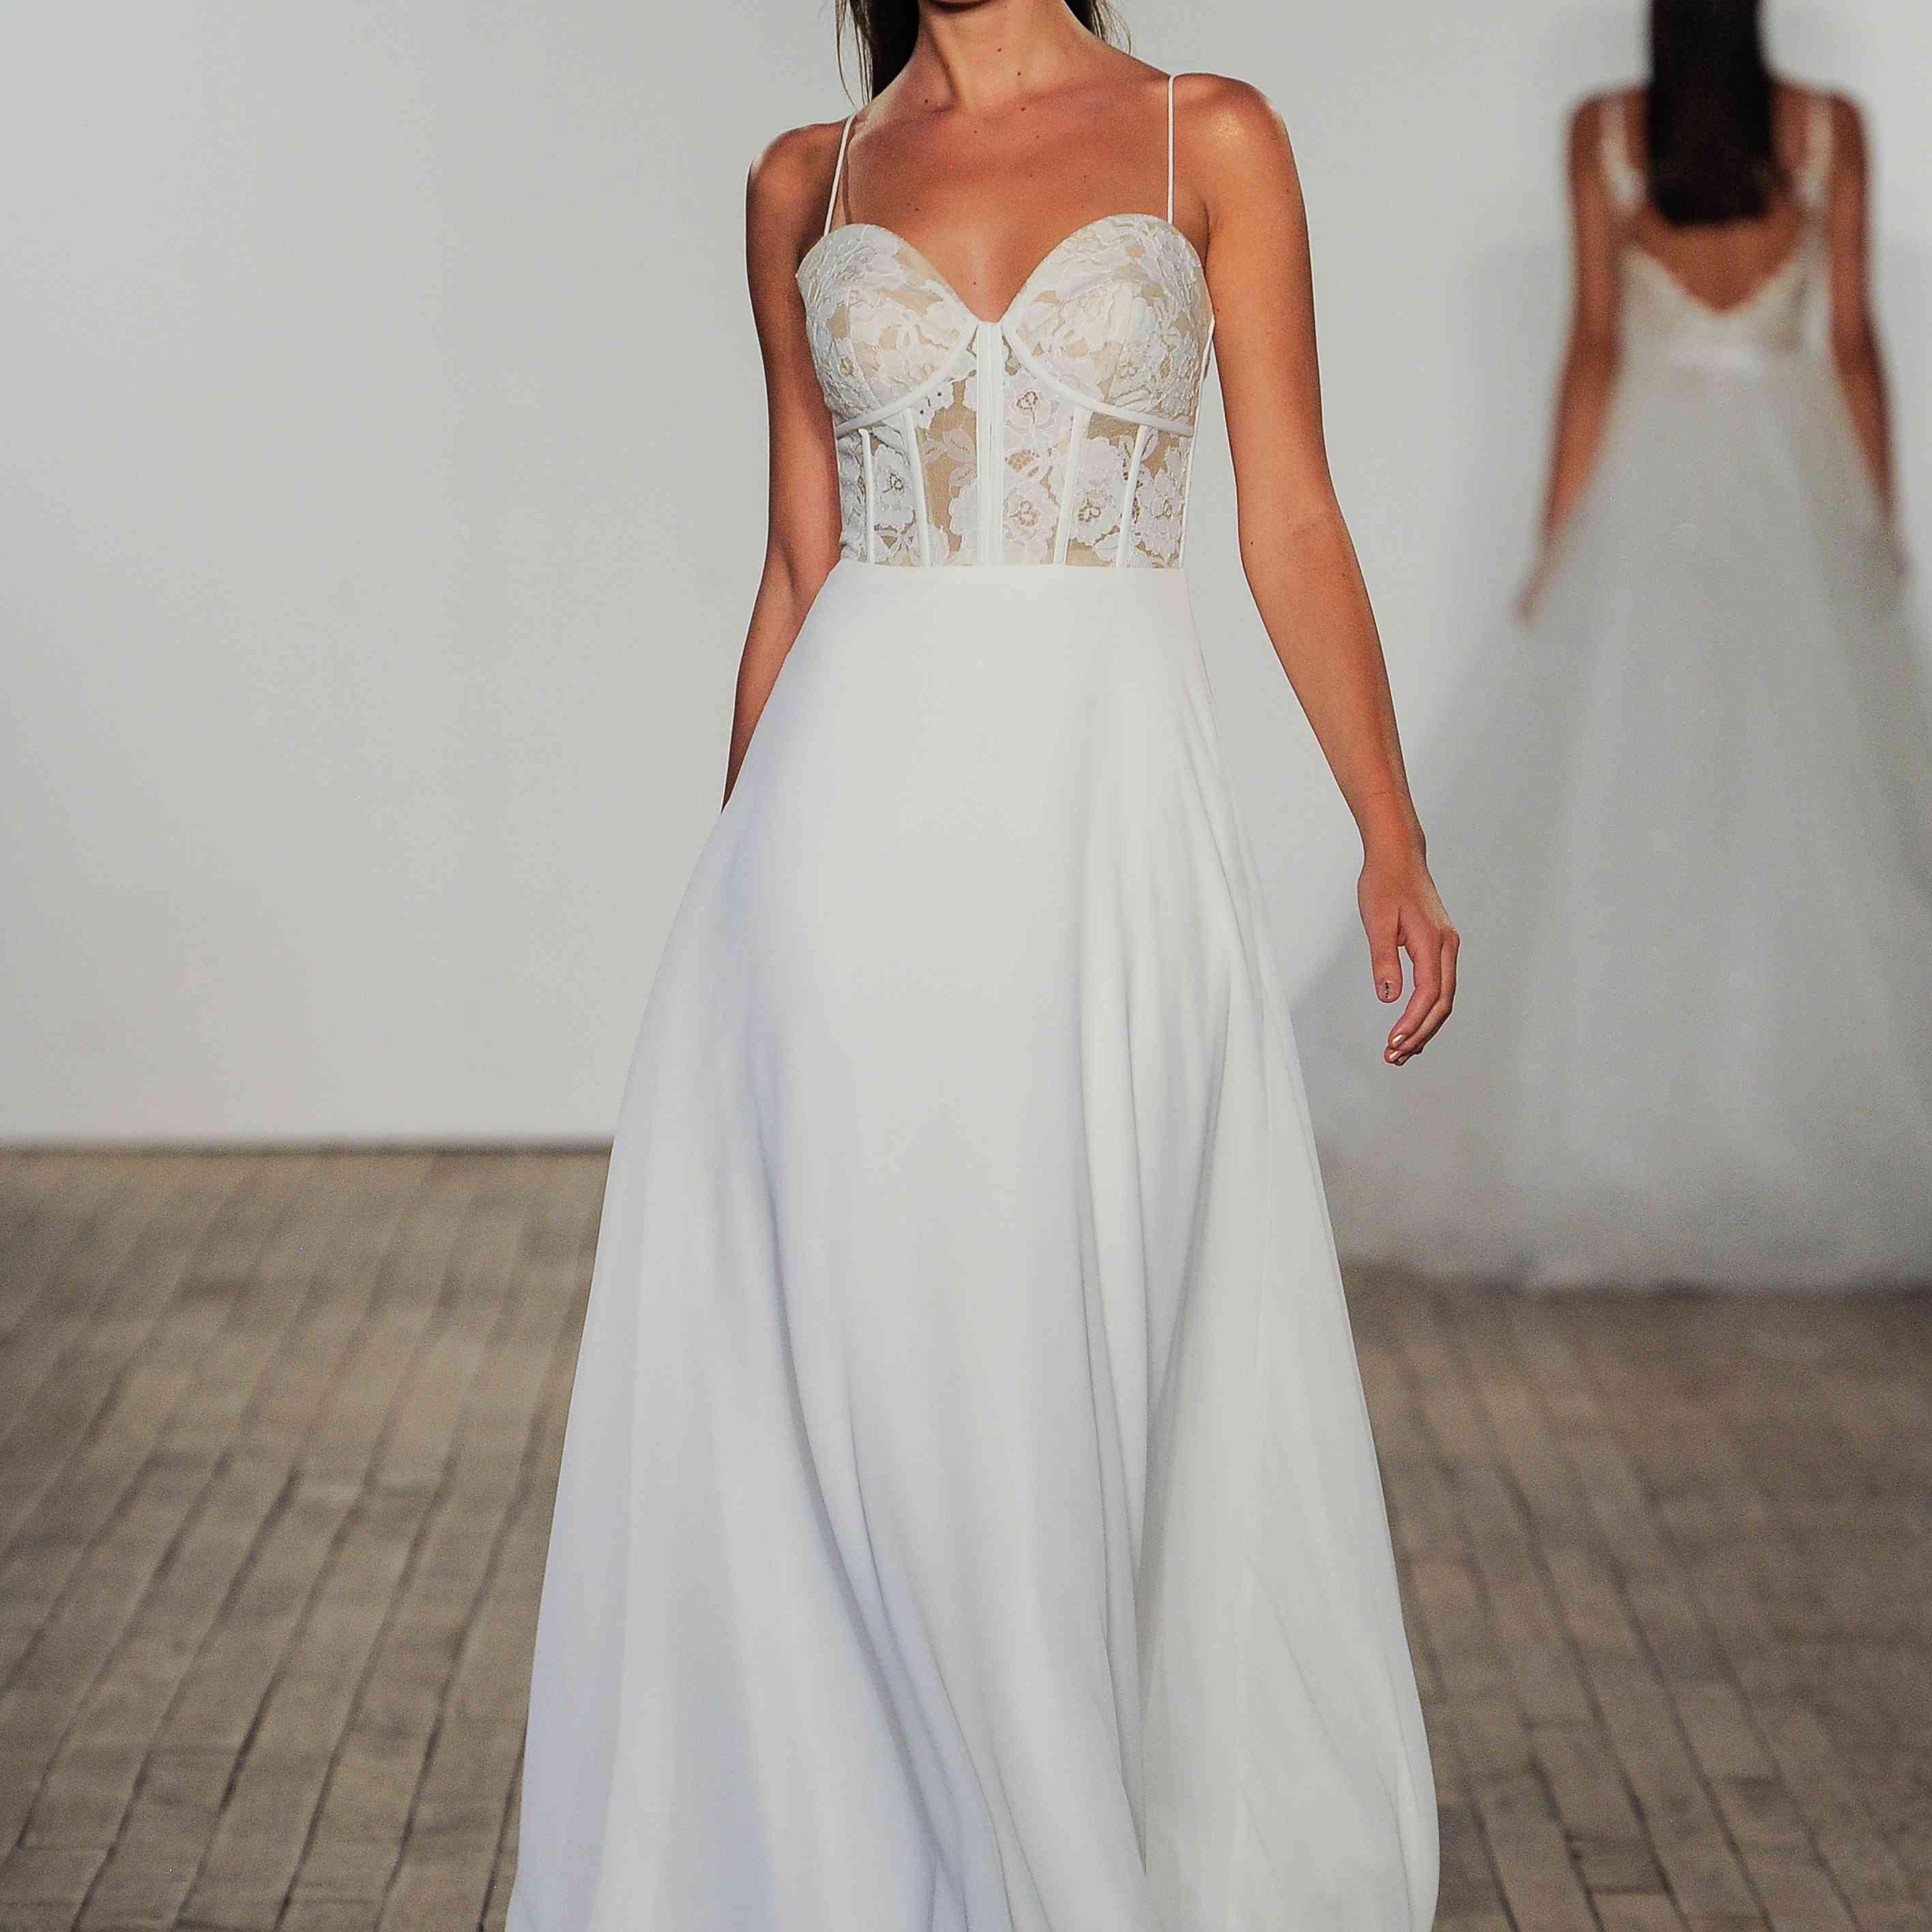 Liv Blush by Hayley Paige Wedding Dress